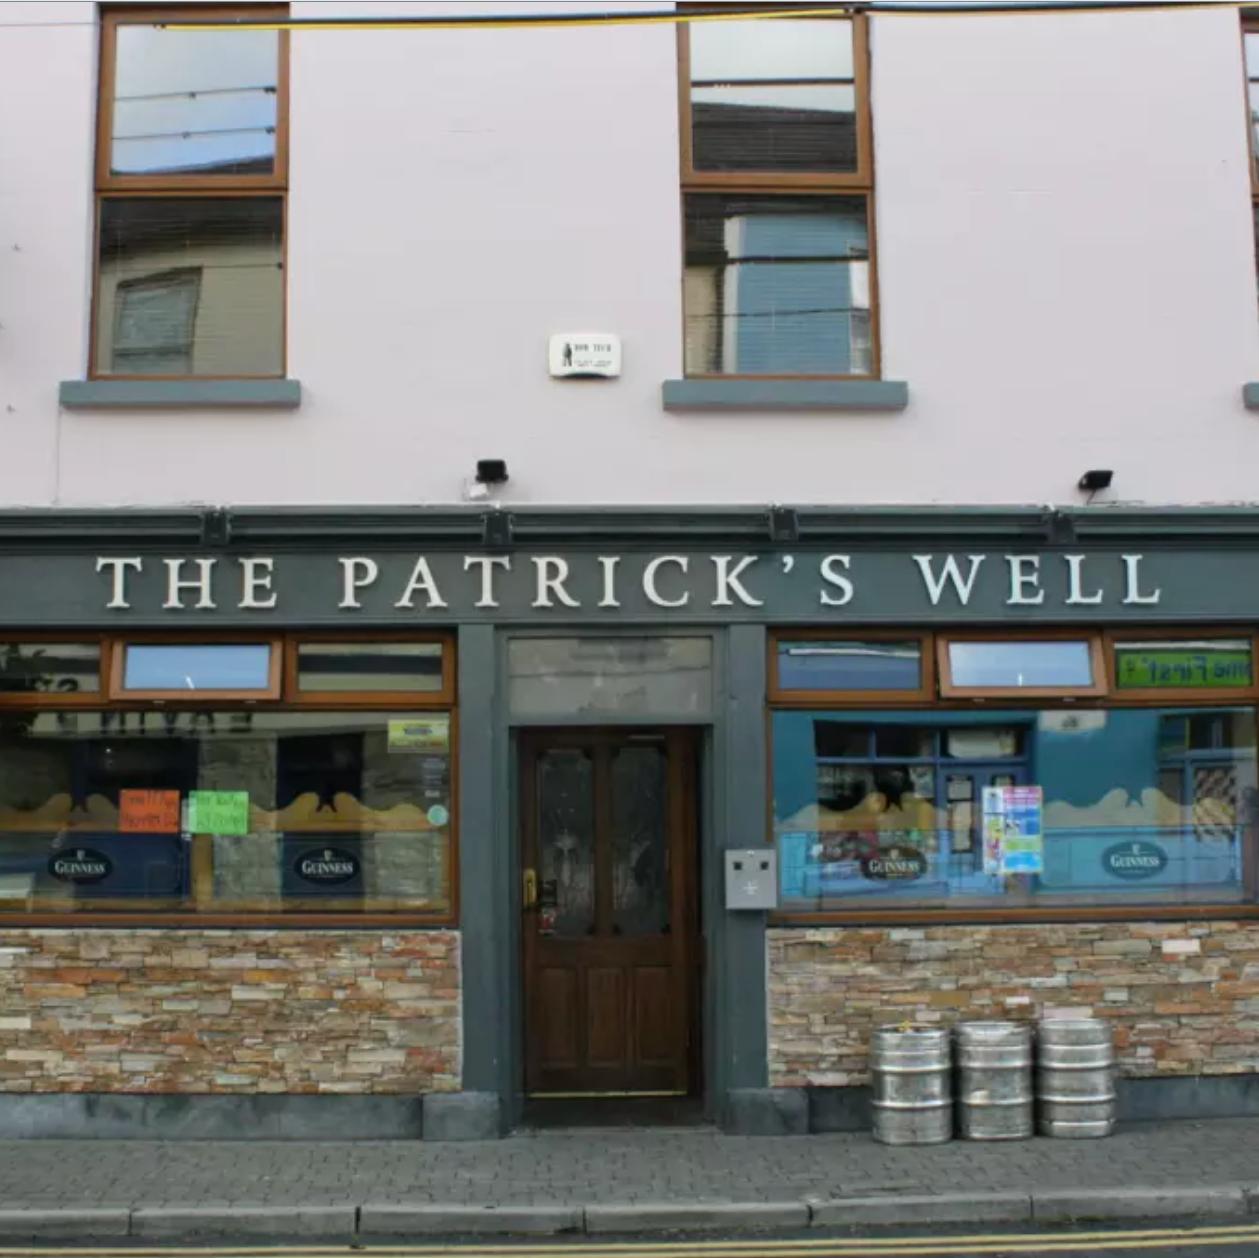 The-Patricks-Well-Boyle-County-Roscommon